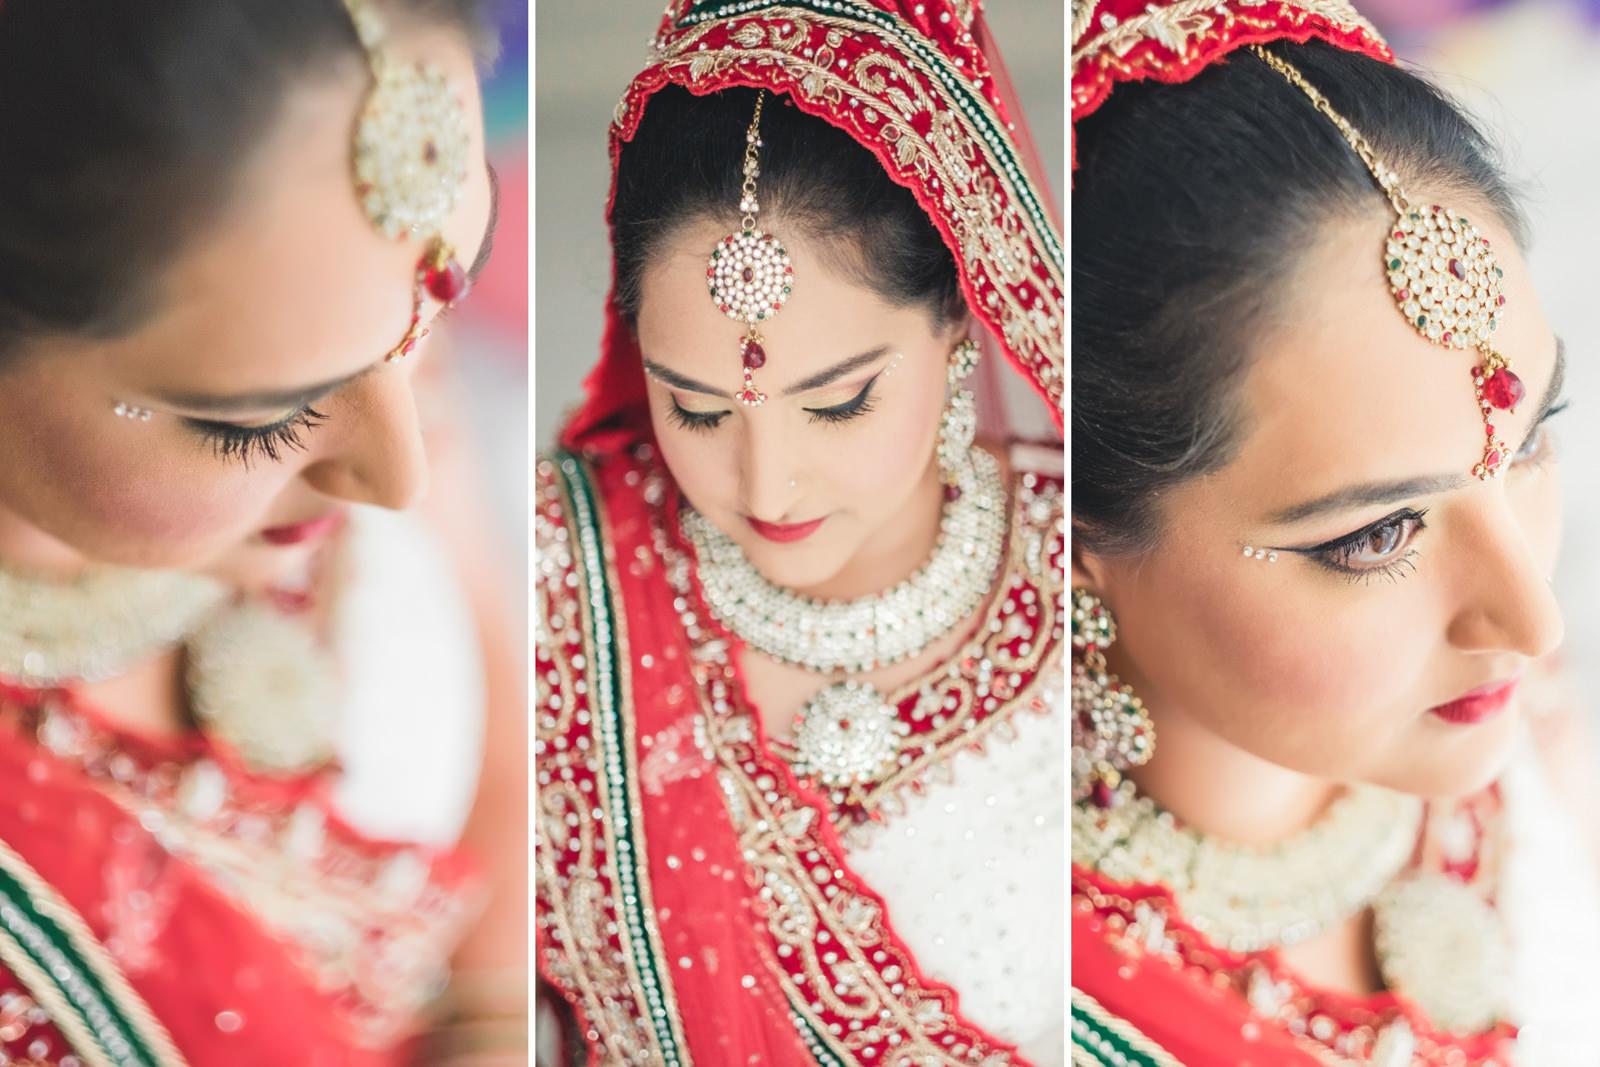 umhlanga westville wedding photography rbadal bridal portrait